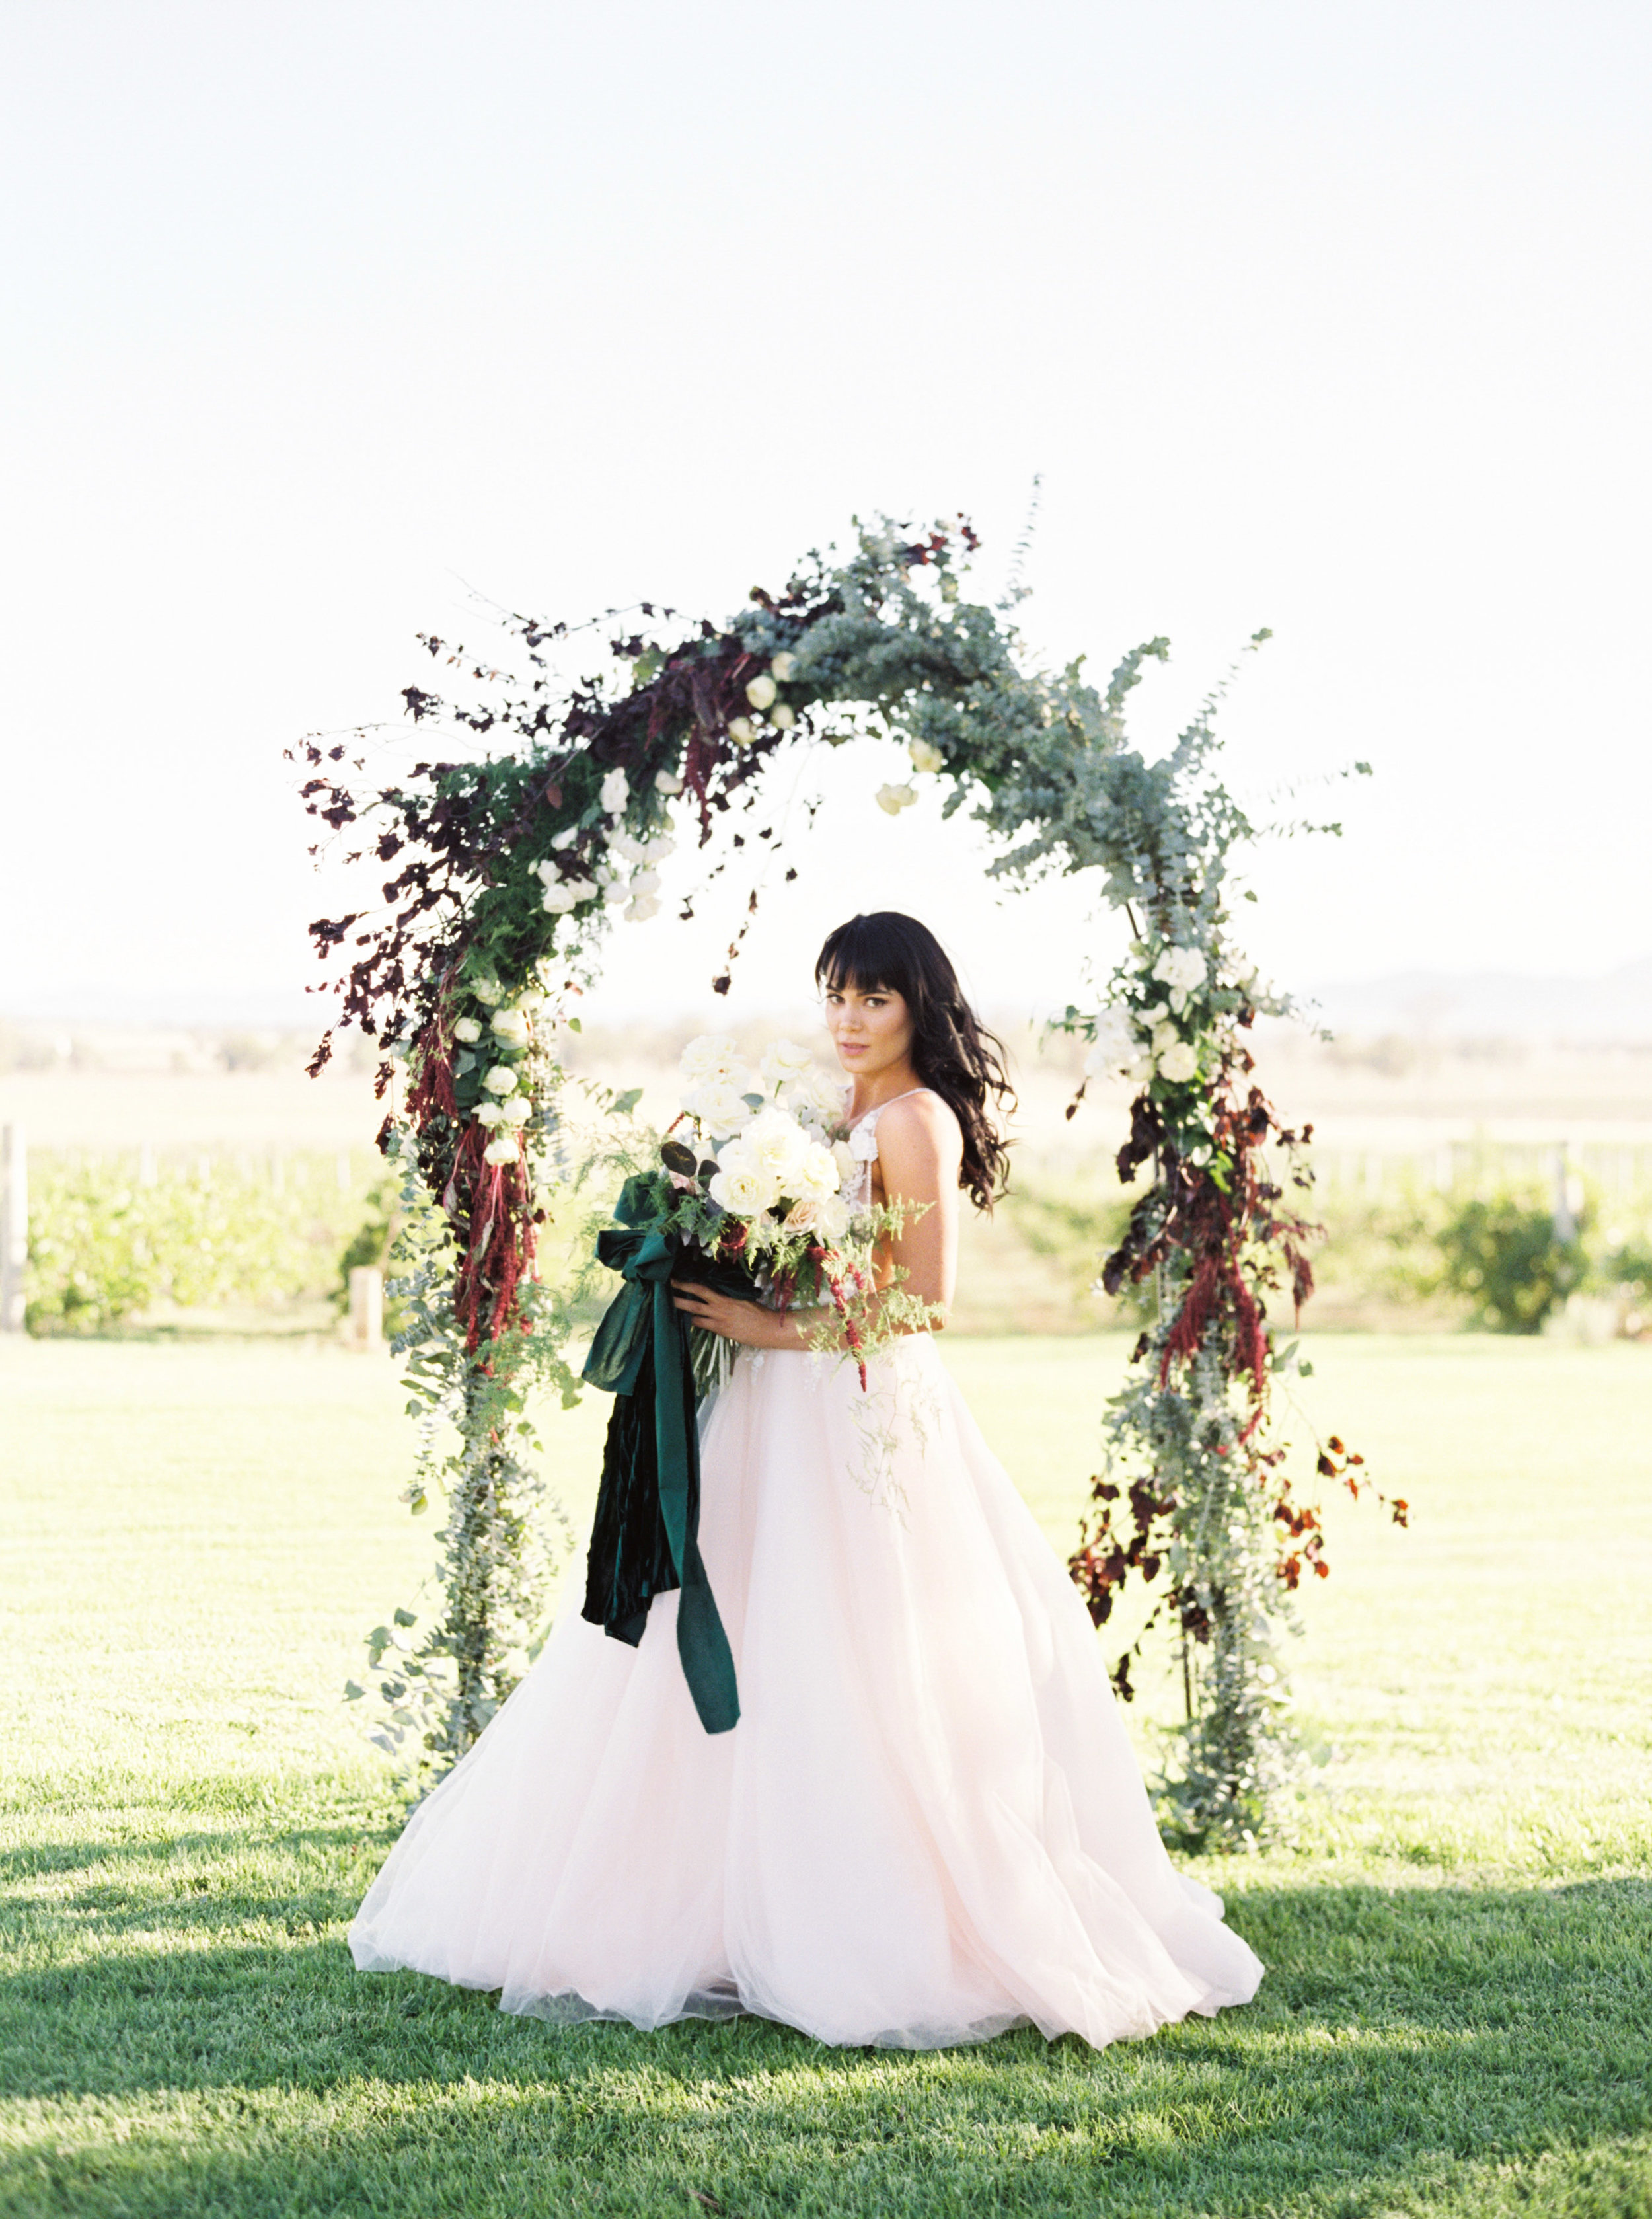 00018- Tamworth NSW Wedding Photographer Sheri McMahon-2.jpg